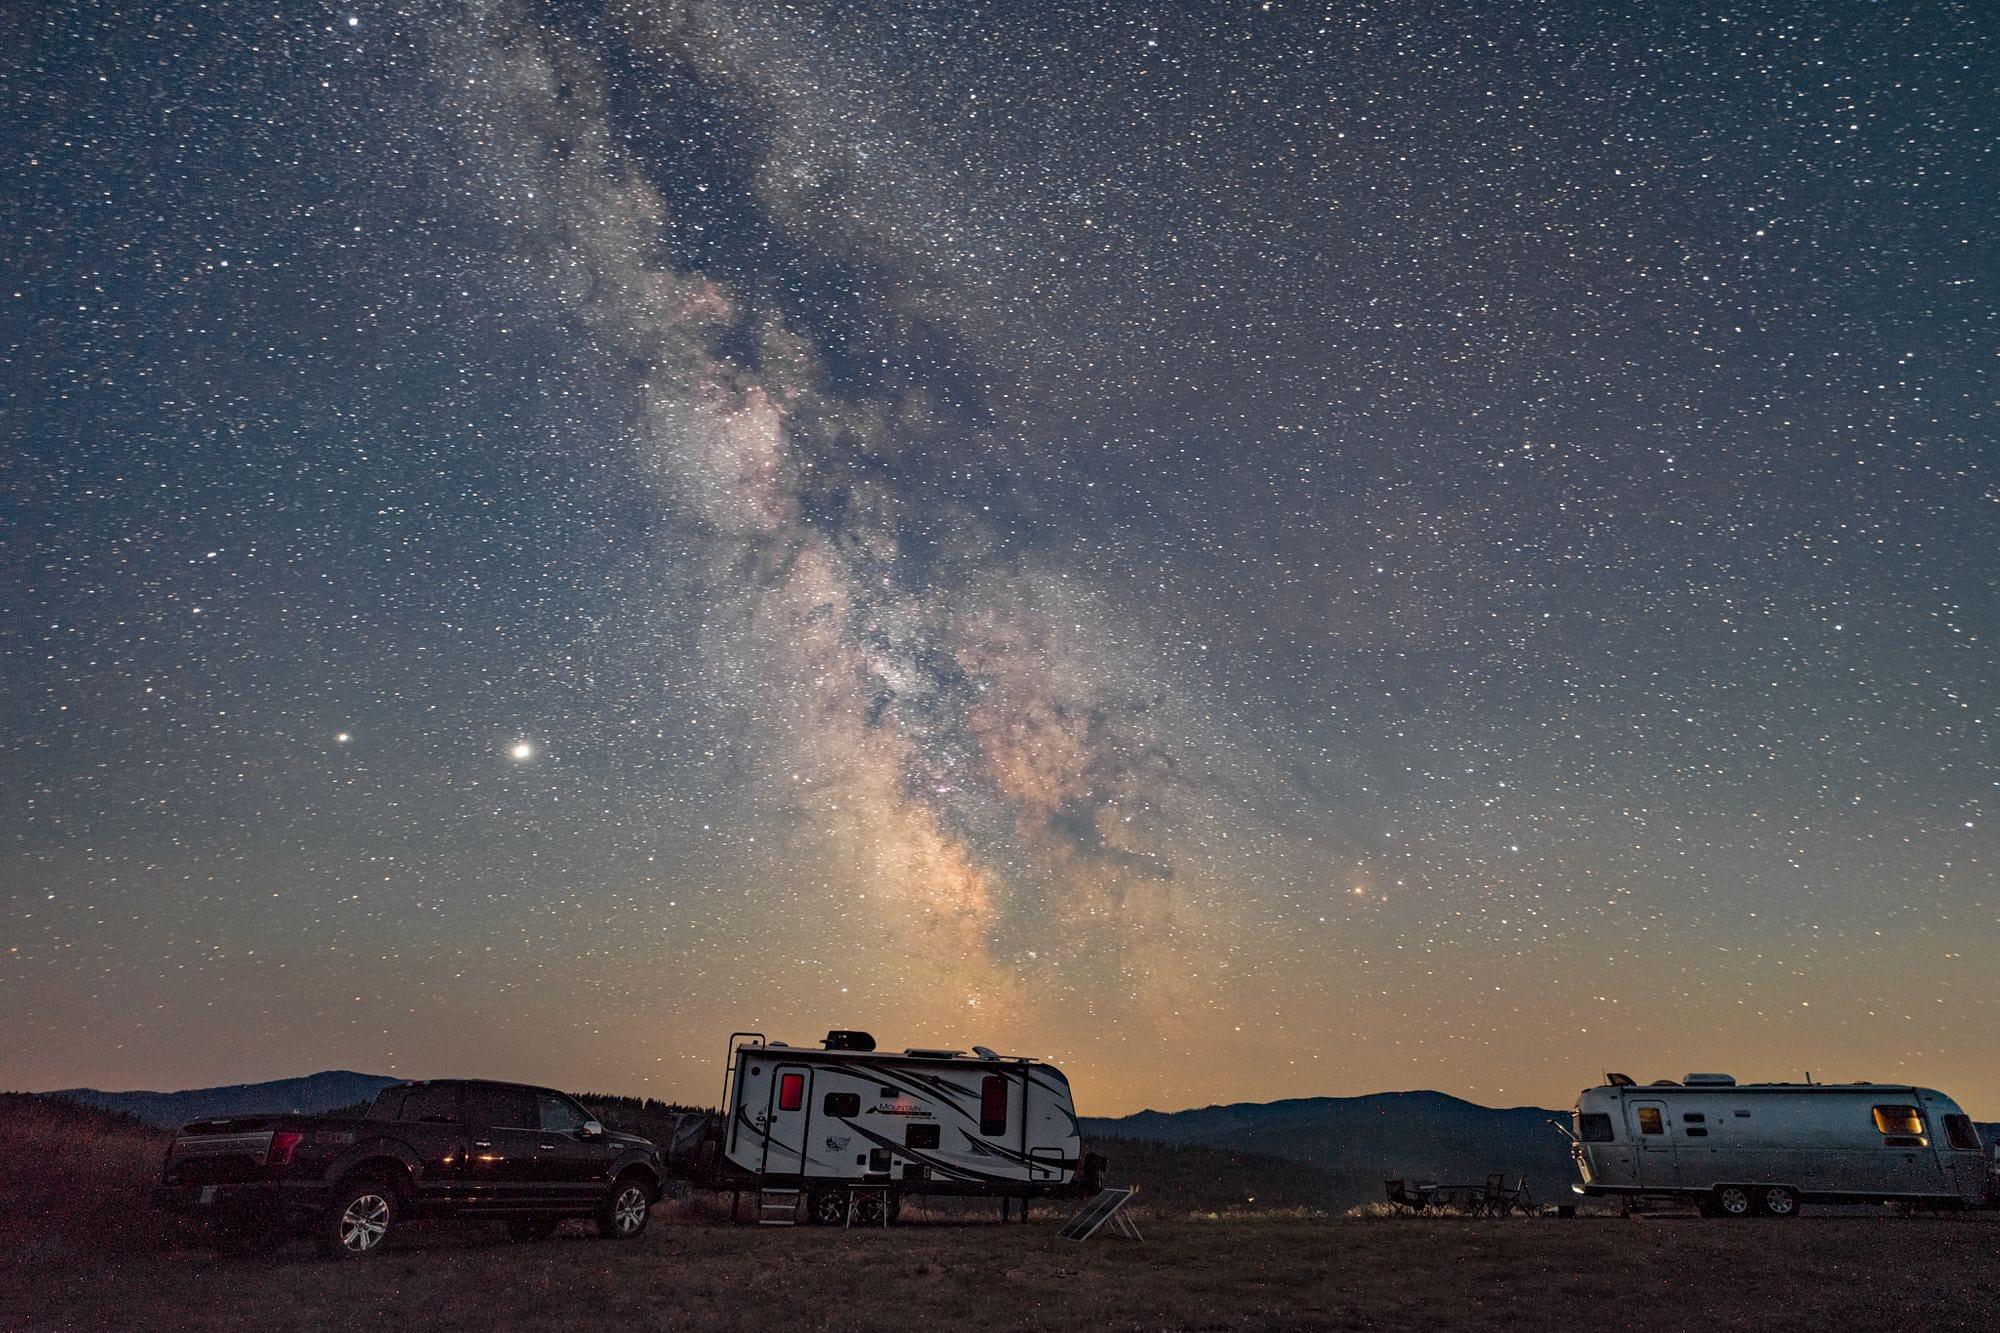 Milky Way Outdoors RV